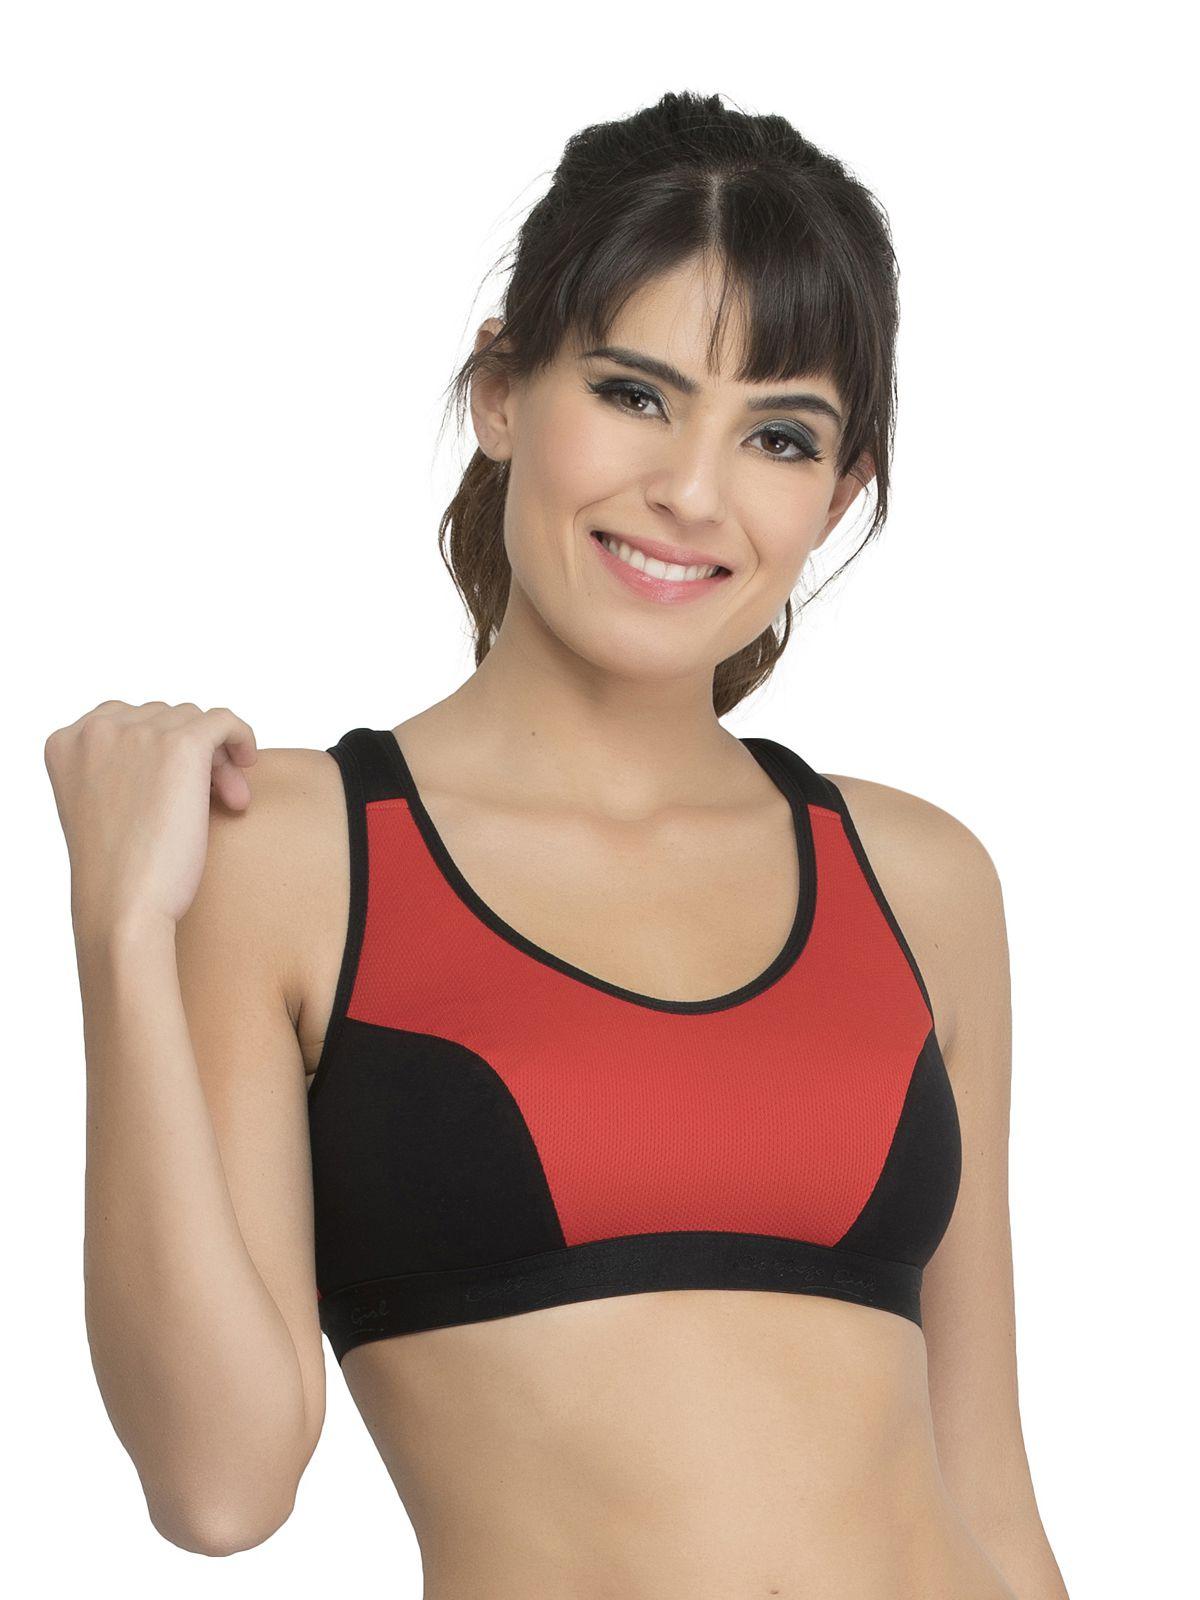 College Girl Cotton Sports Bra - Red